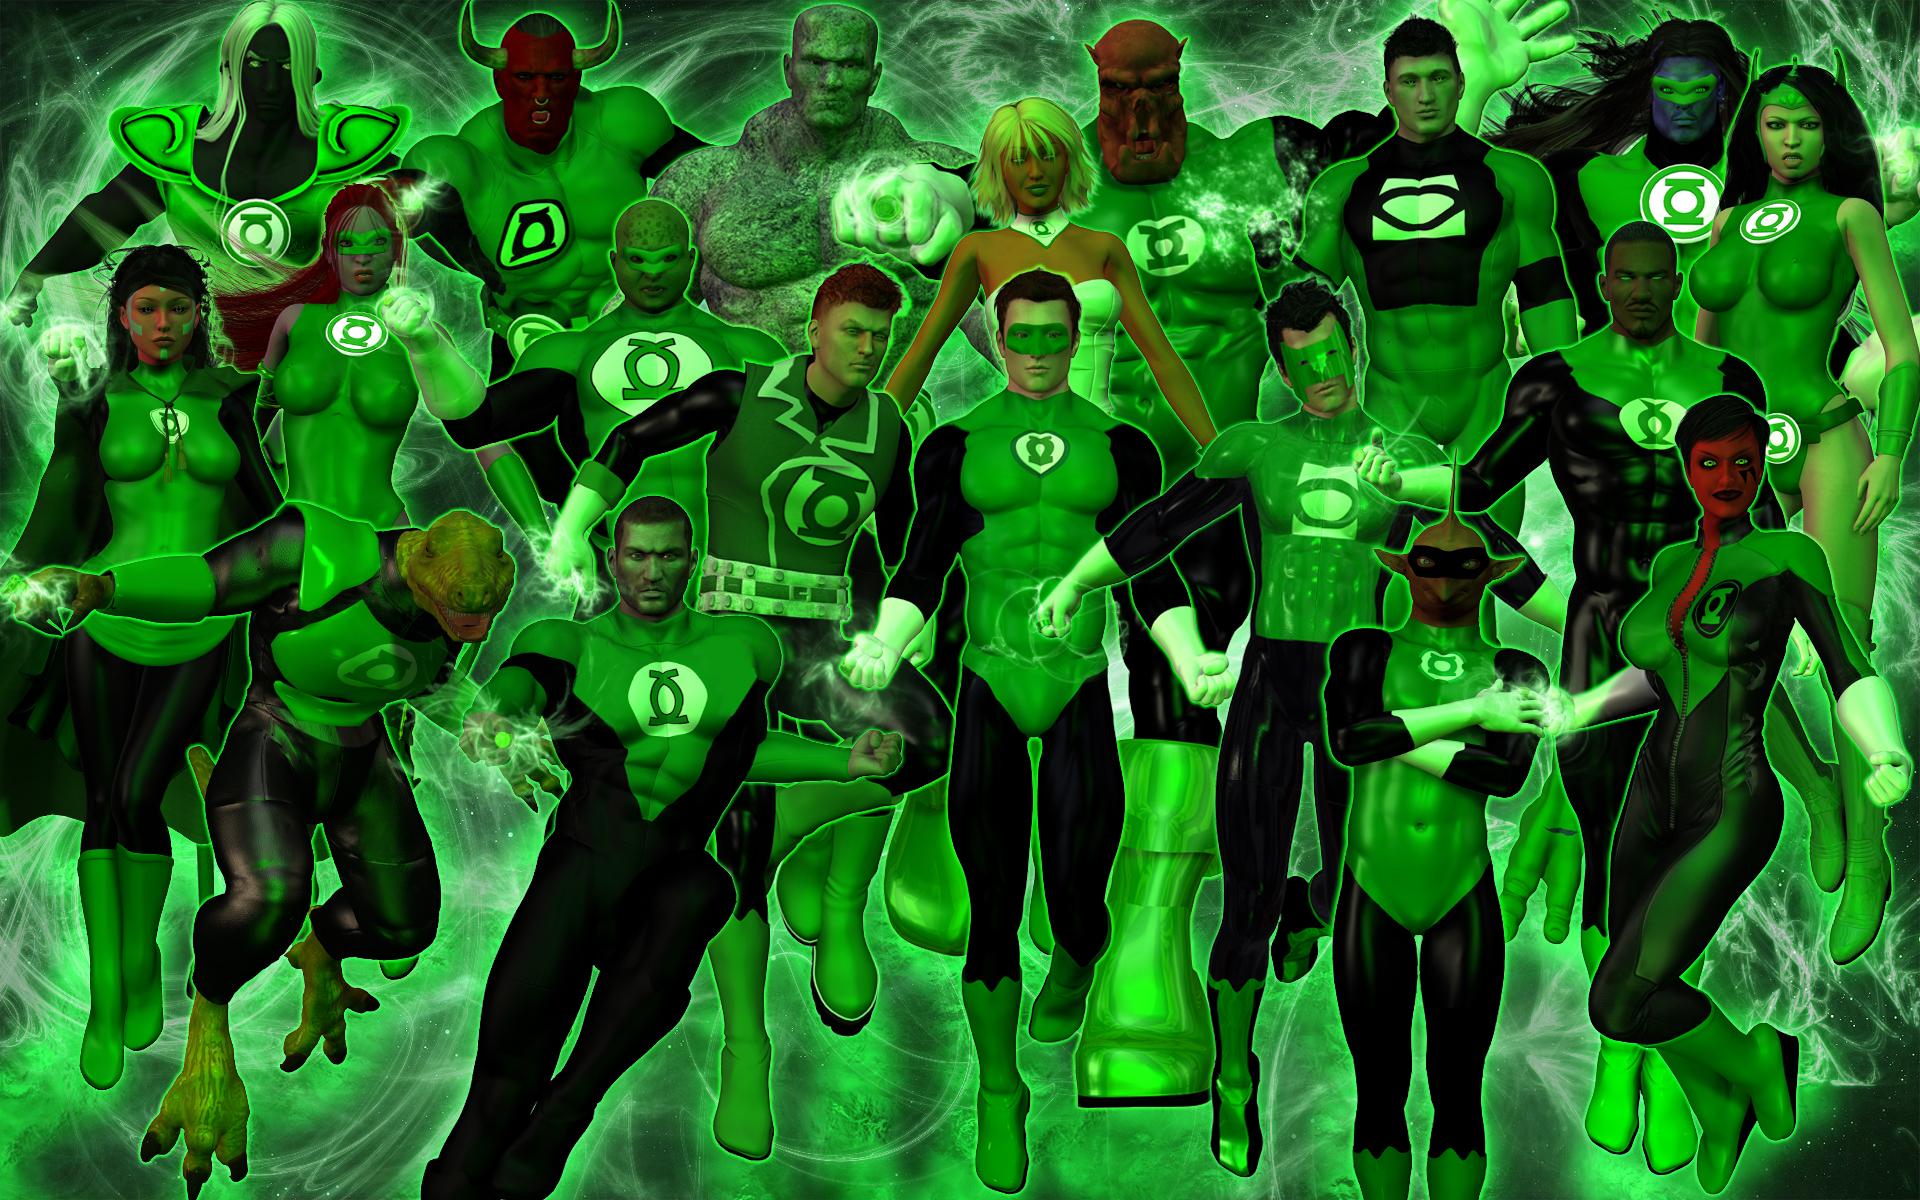 Green Lantern Corps Wallpaper The green lantern corps by 1920x1200